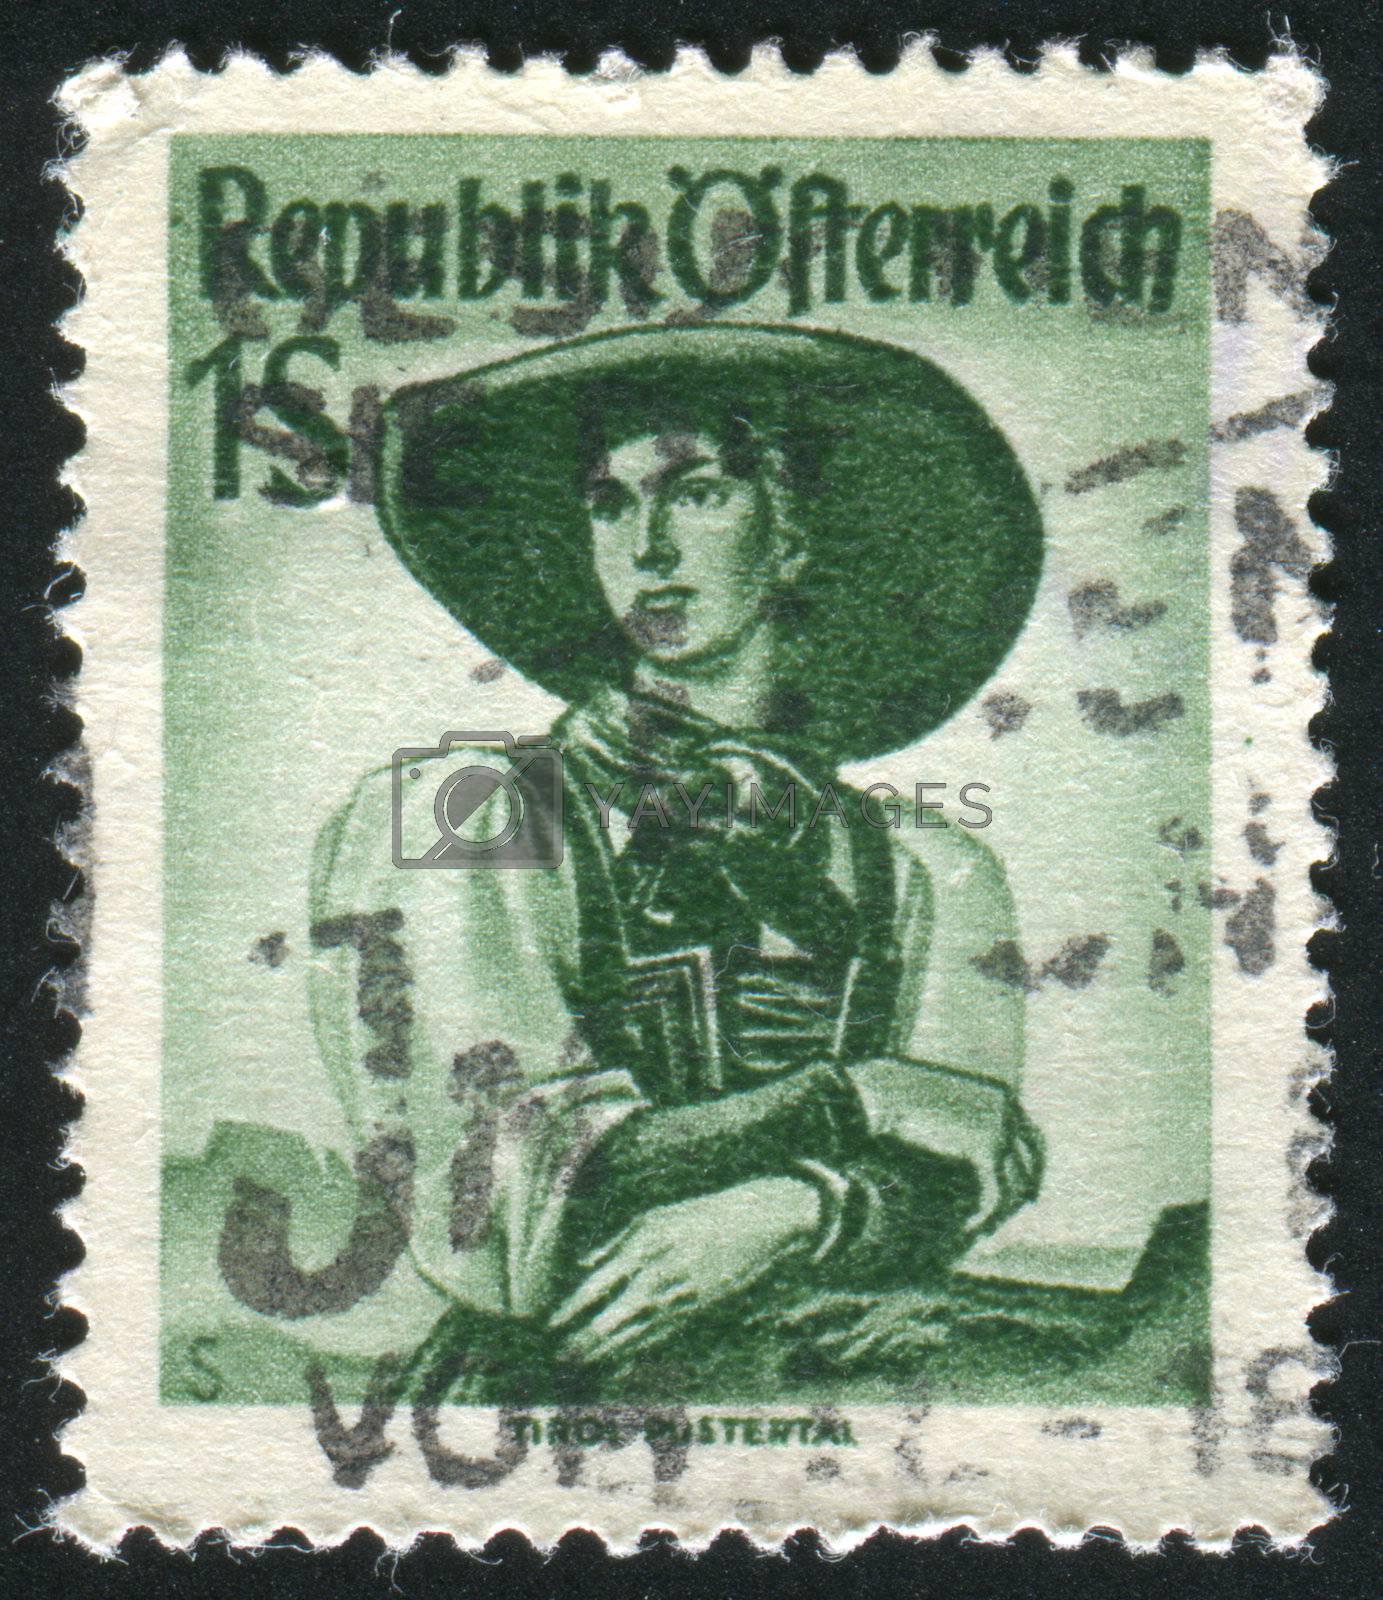 AUSTRIA - CIRCA 1948: stamp printed by Austria, shows Austrian Costumes, Tyrol, Puster Valley, circa 1948